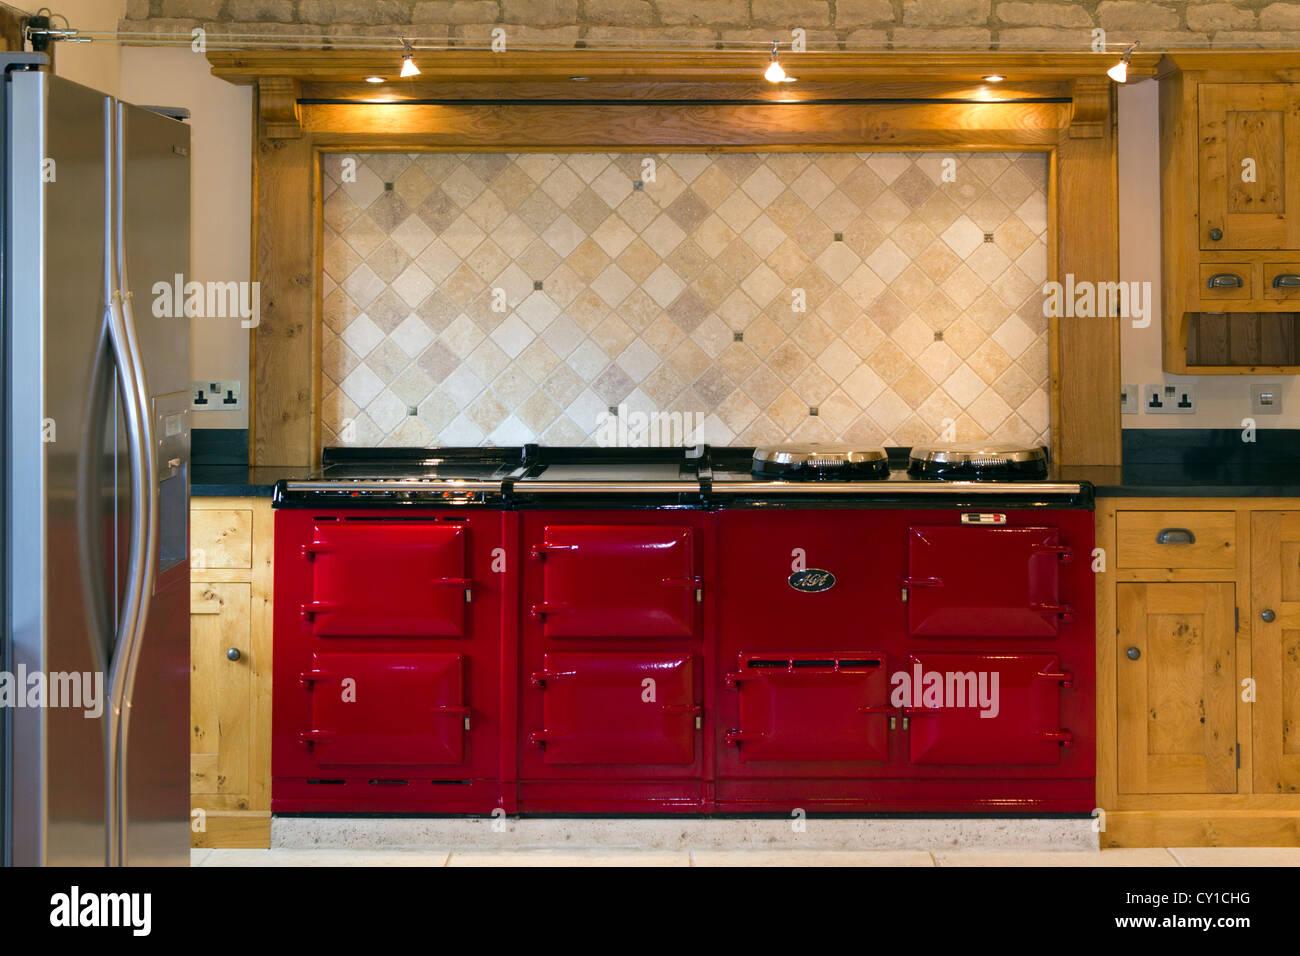 Aga Herd lebhafte rote doppel aga herd in einer gehobenen küche stockfoto